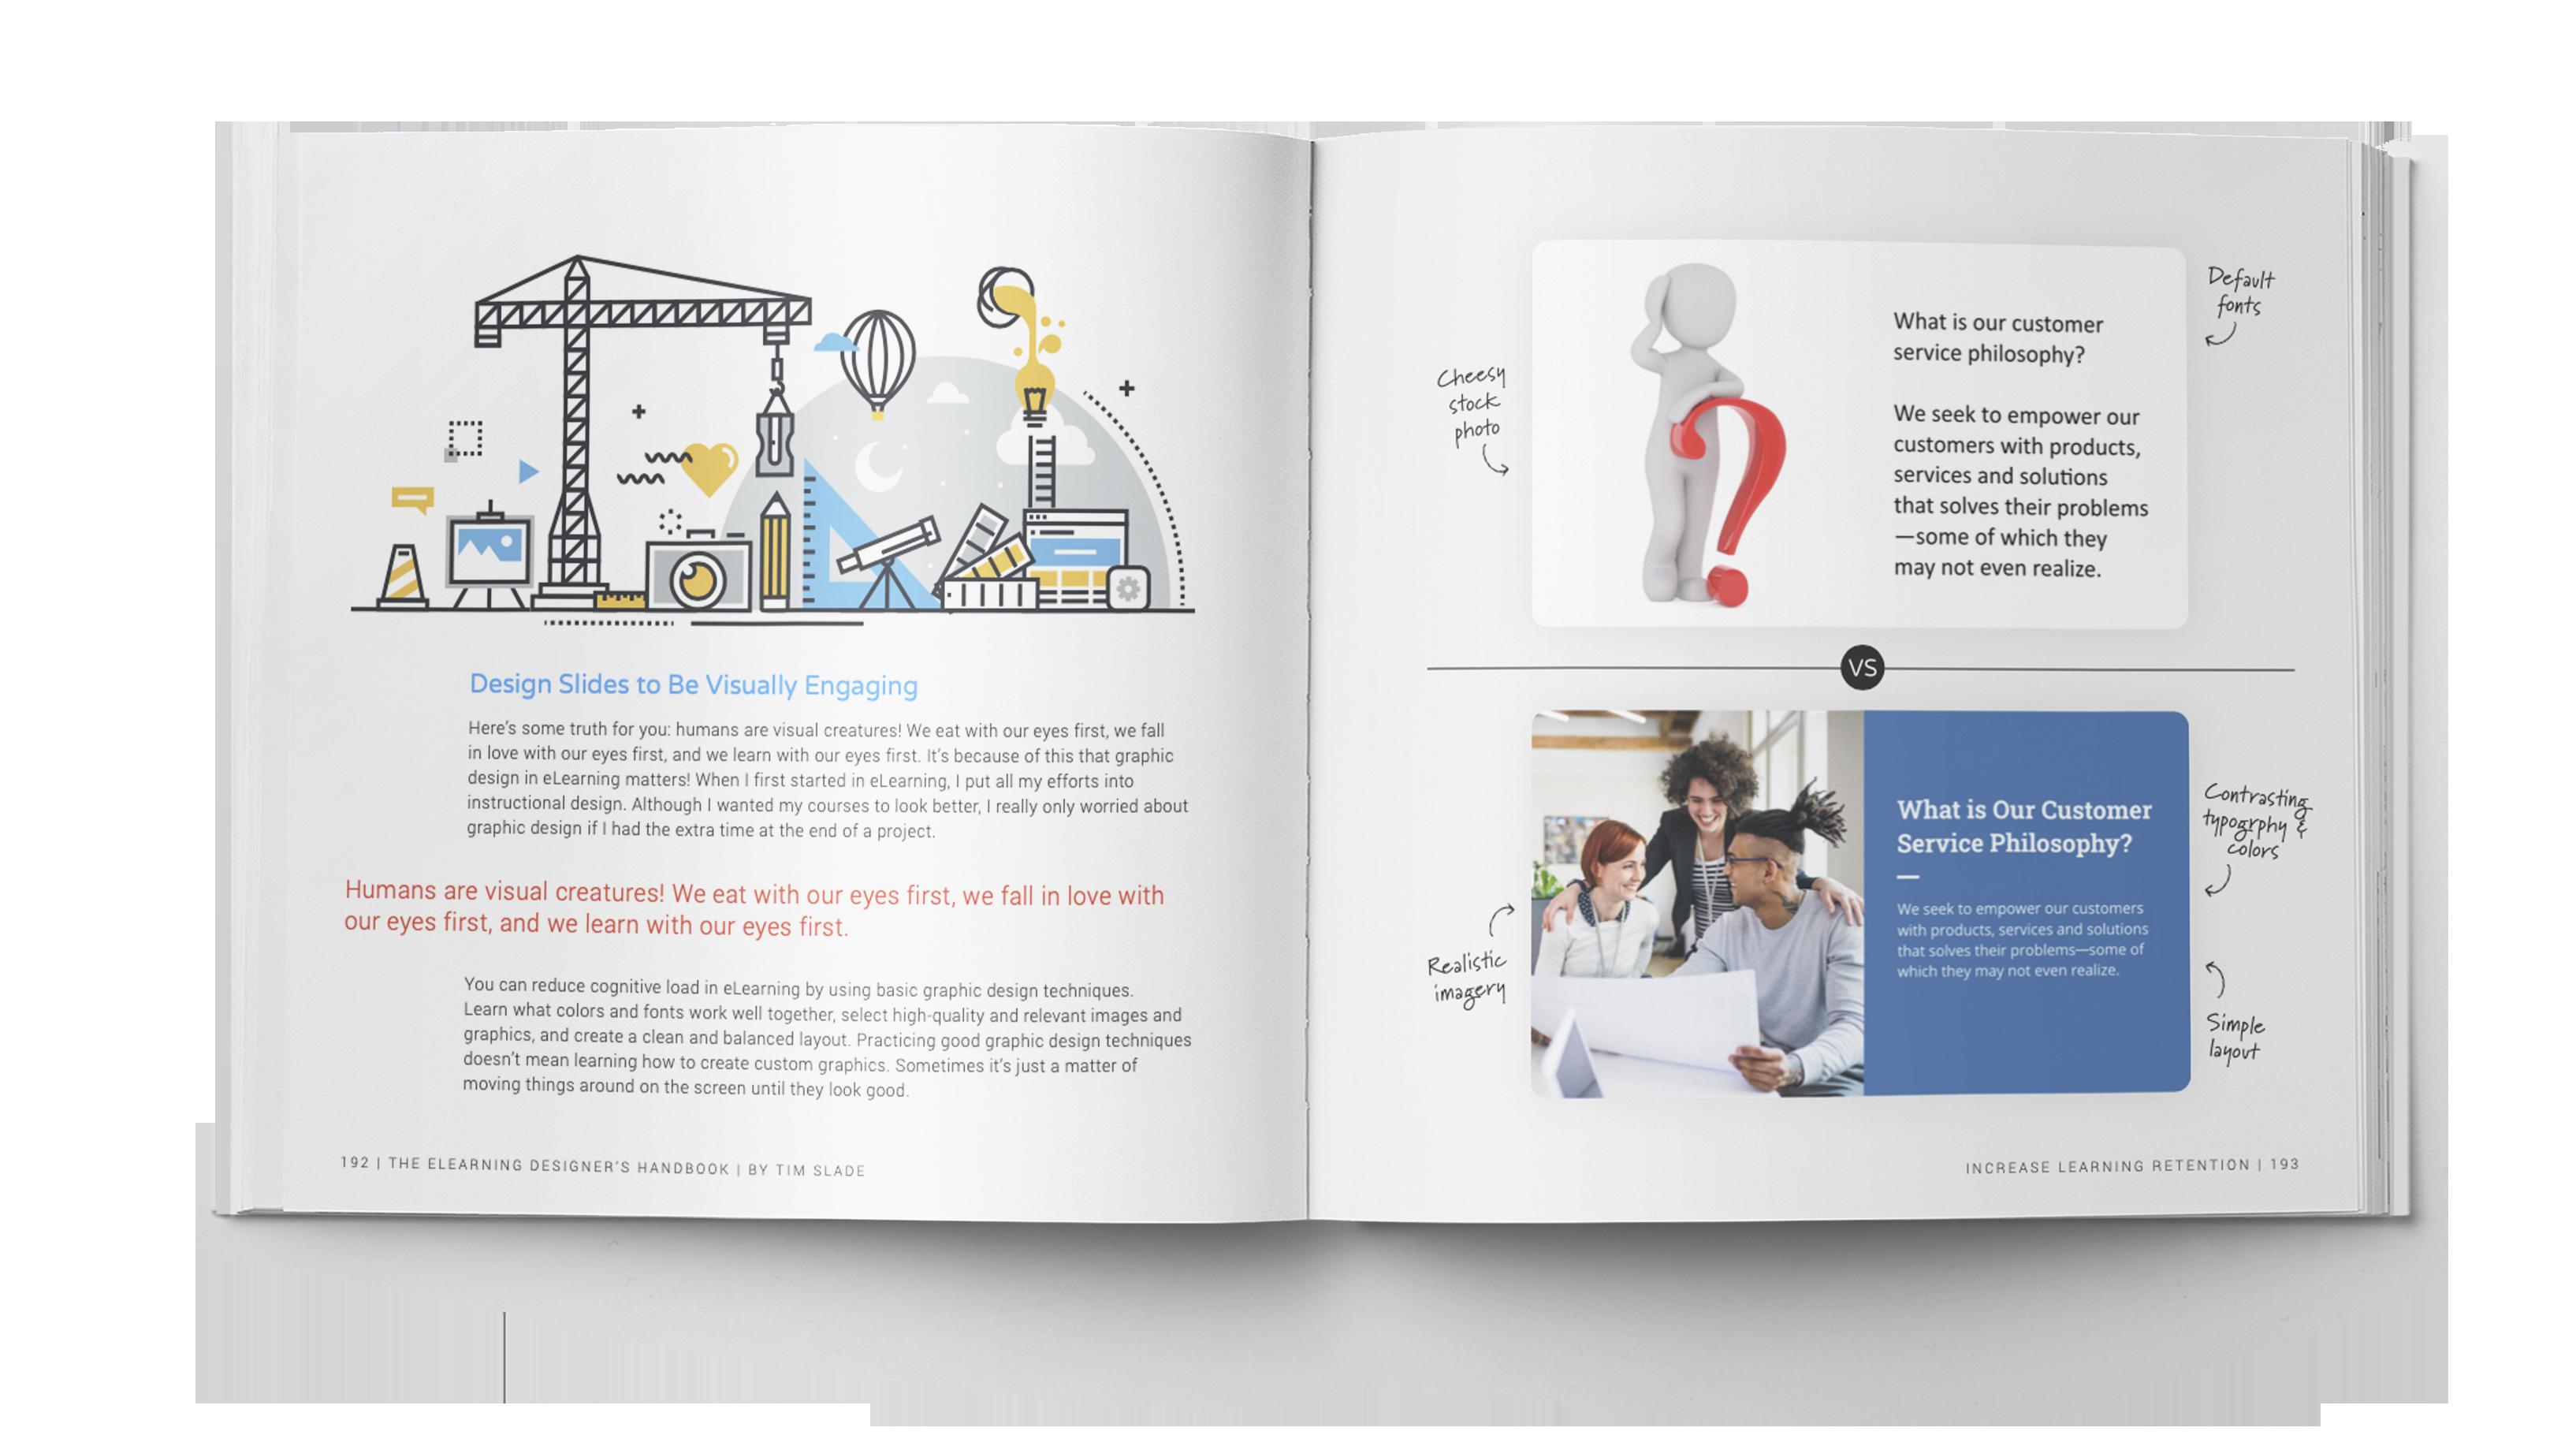 The eLearning Designer's Handbook by Tim Slade | Increase Learning Retention | Freelance eLearning Designer | The eLearning Designer's Academy